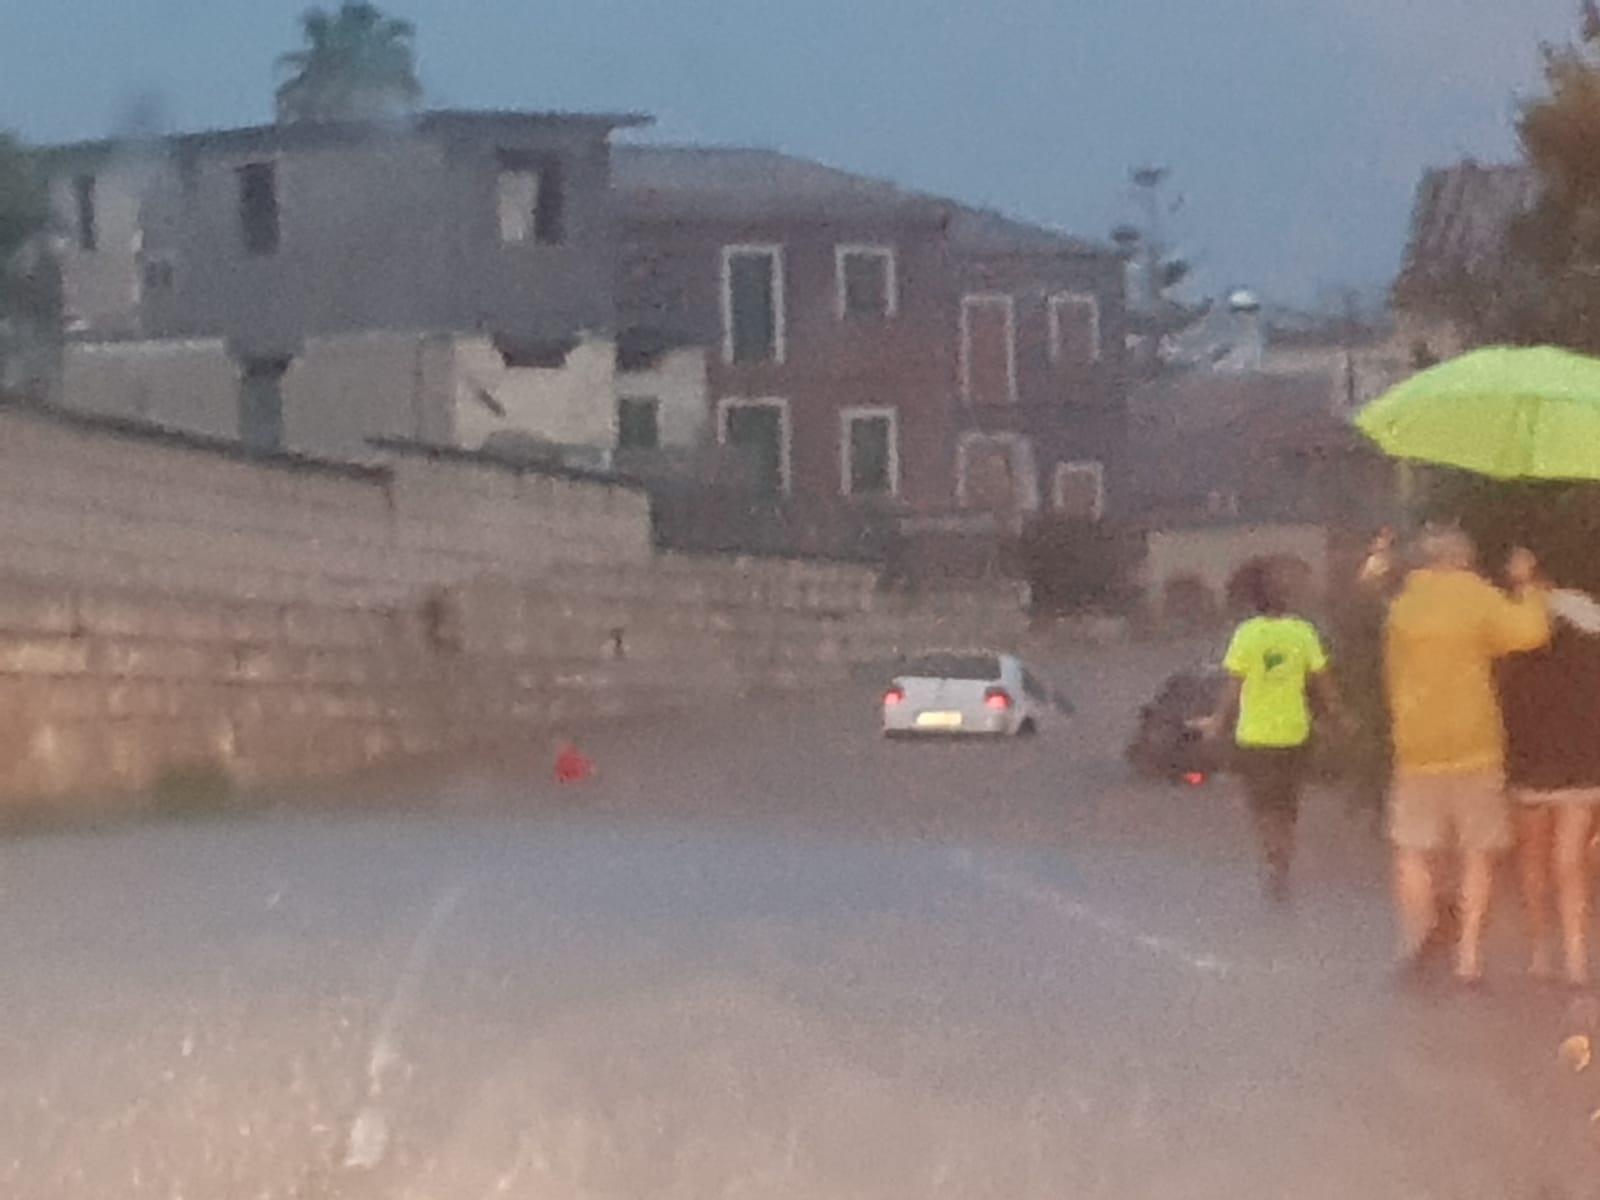 Graves inundaciones en Sant Llorenç, Mallorca a causa de las fuertes lluvias